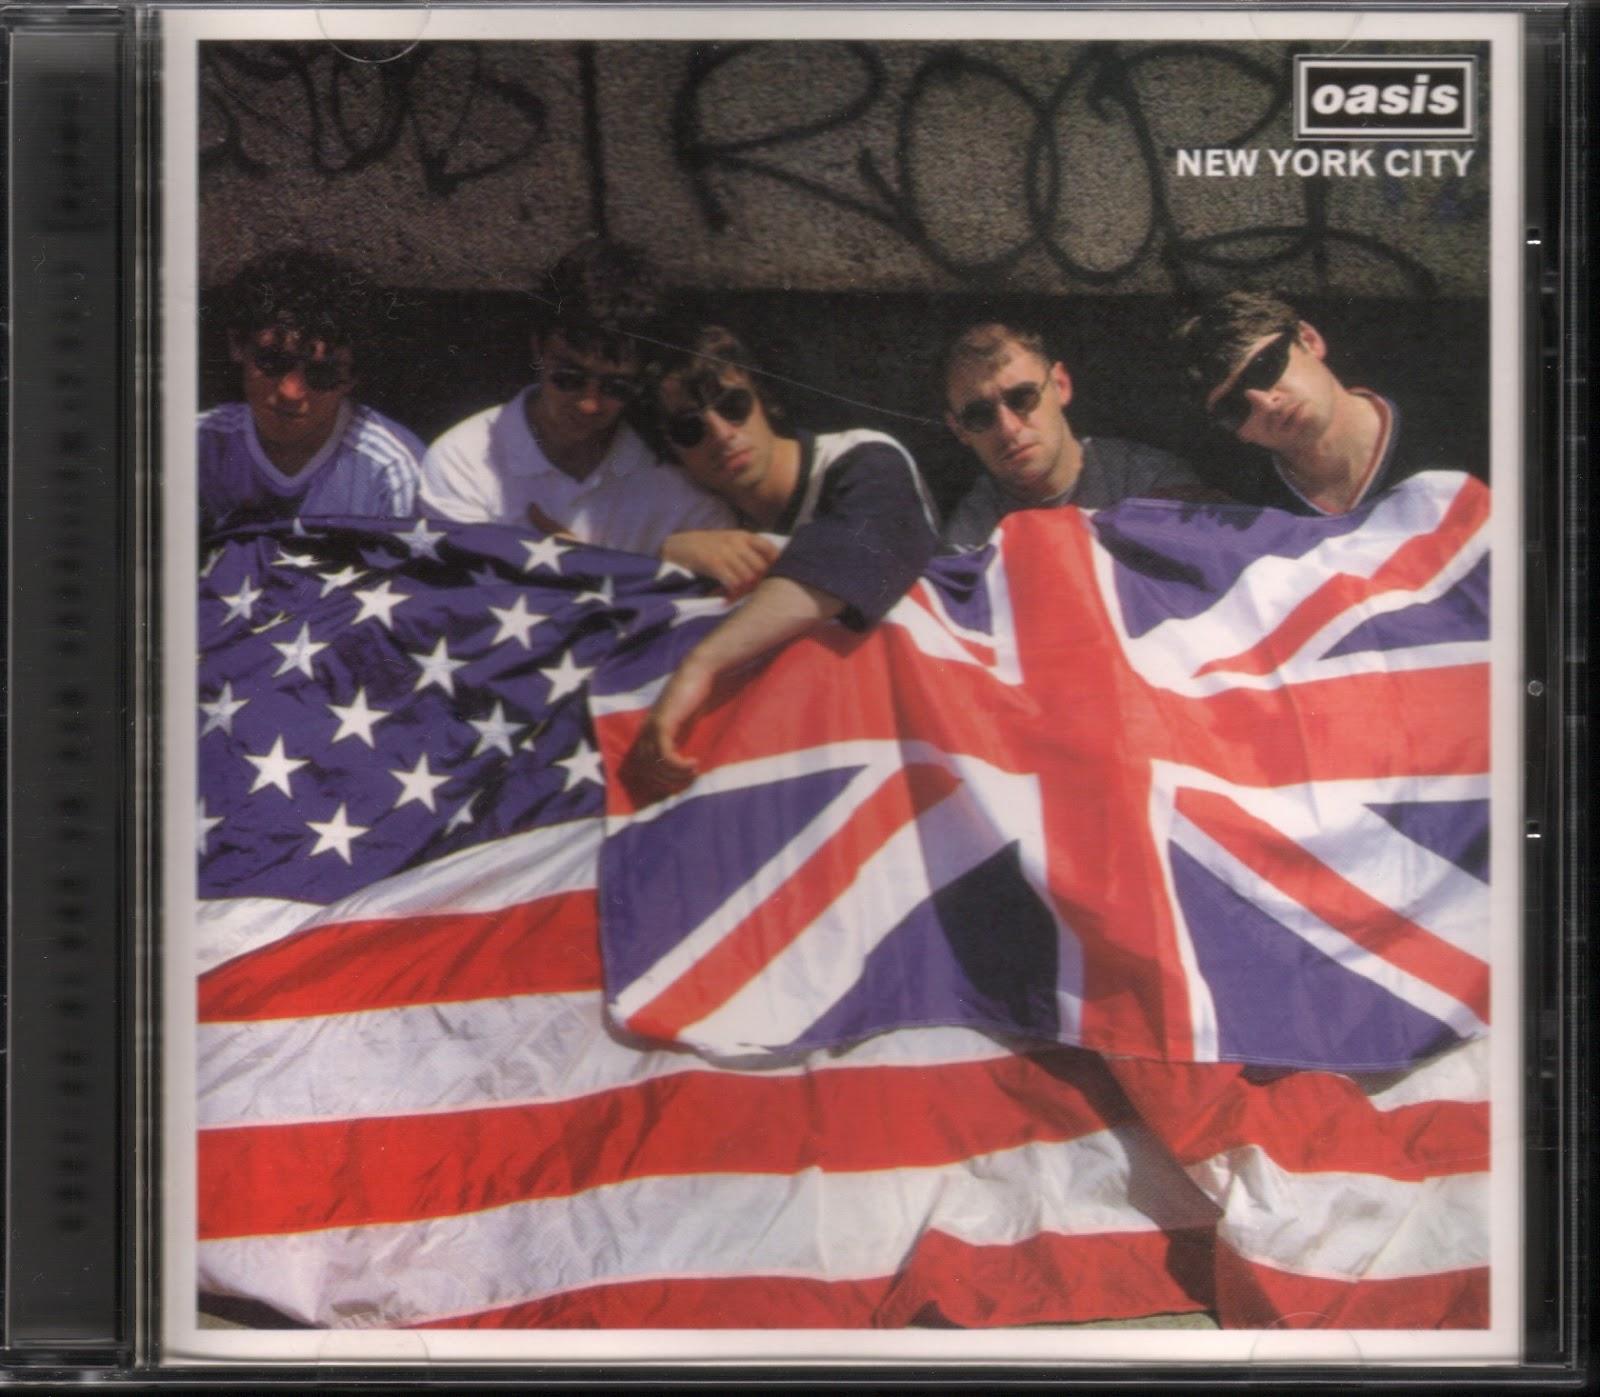 Oasis Bootlegs From Fuckuoka: New York City (FLBB011)